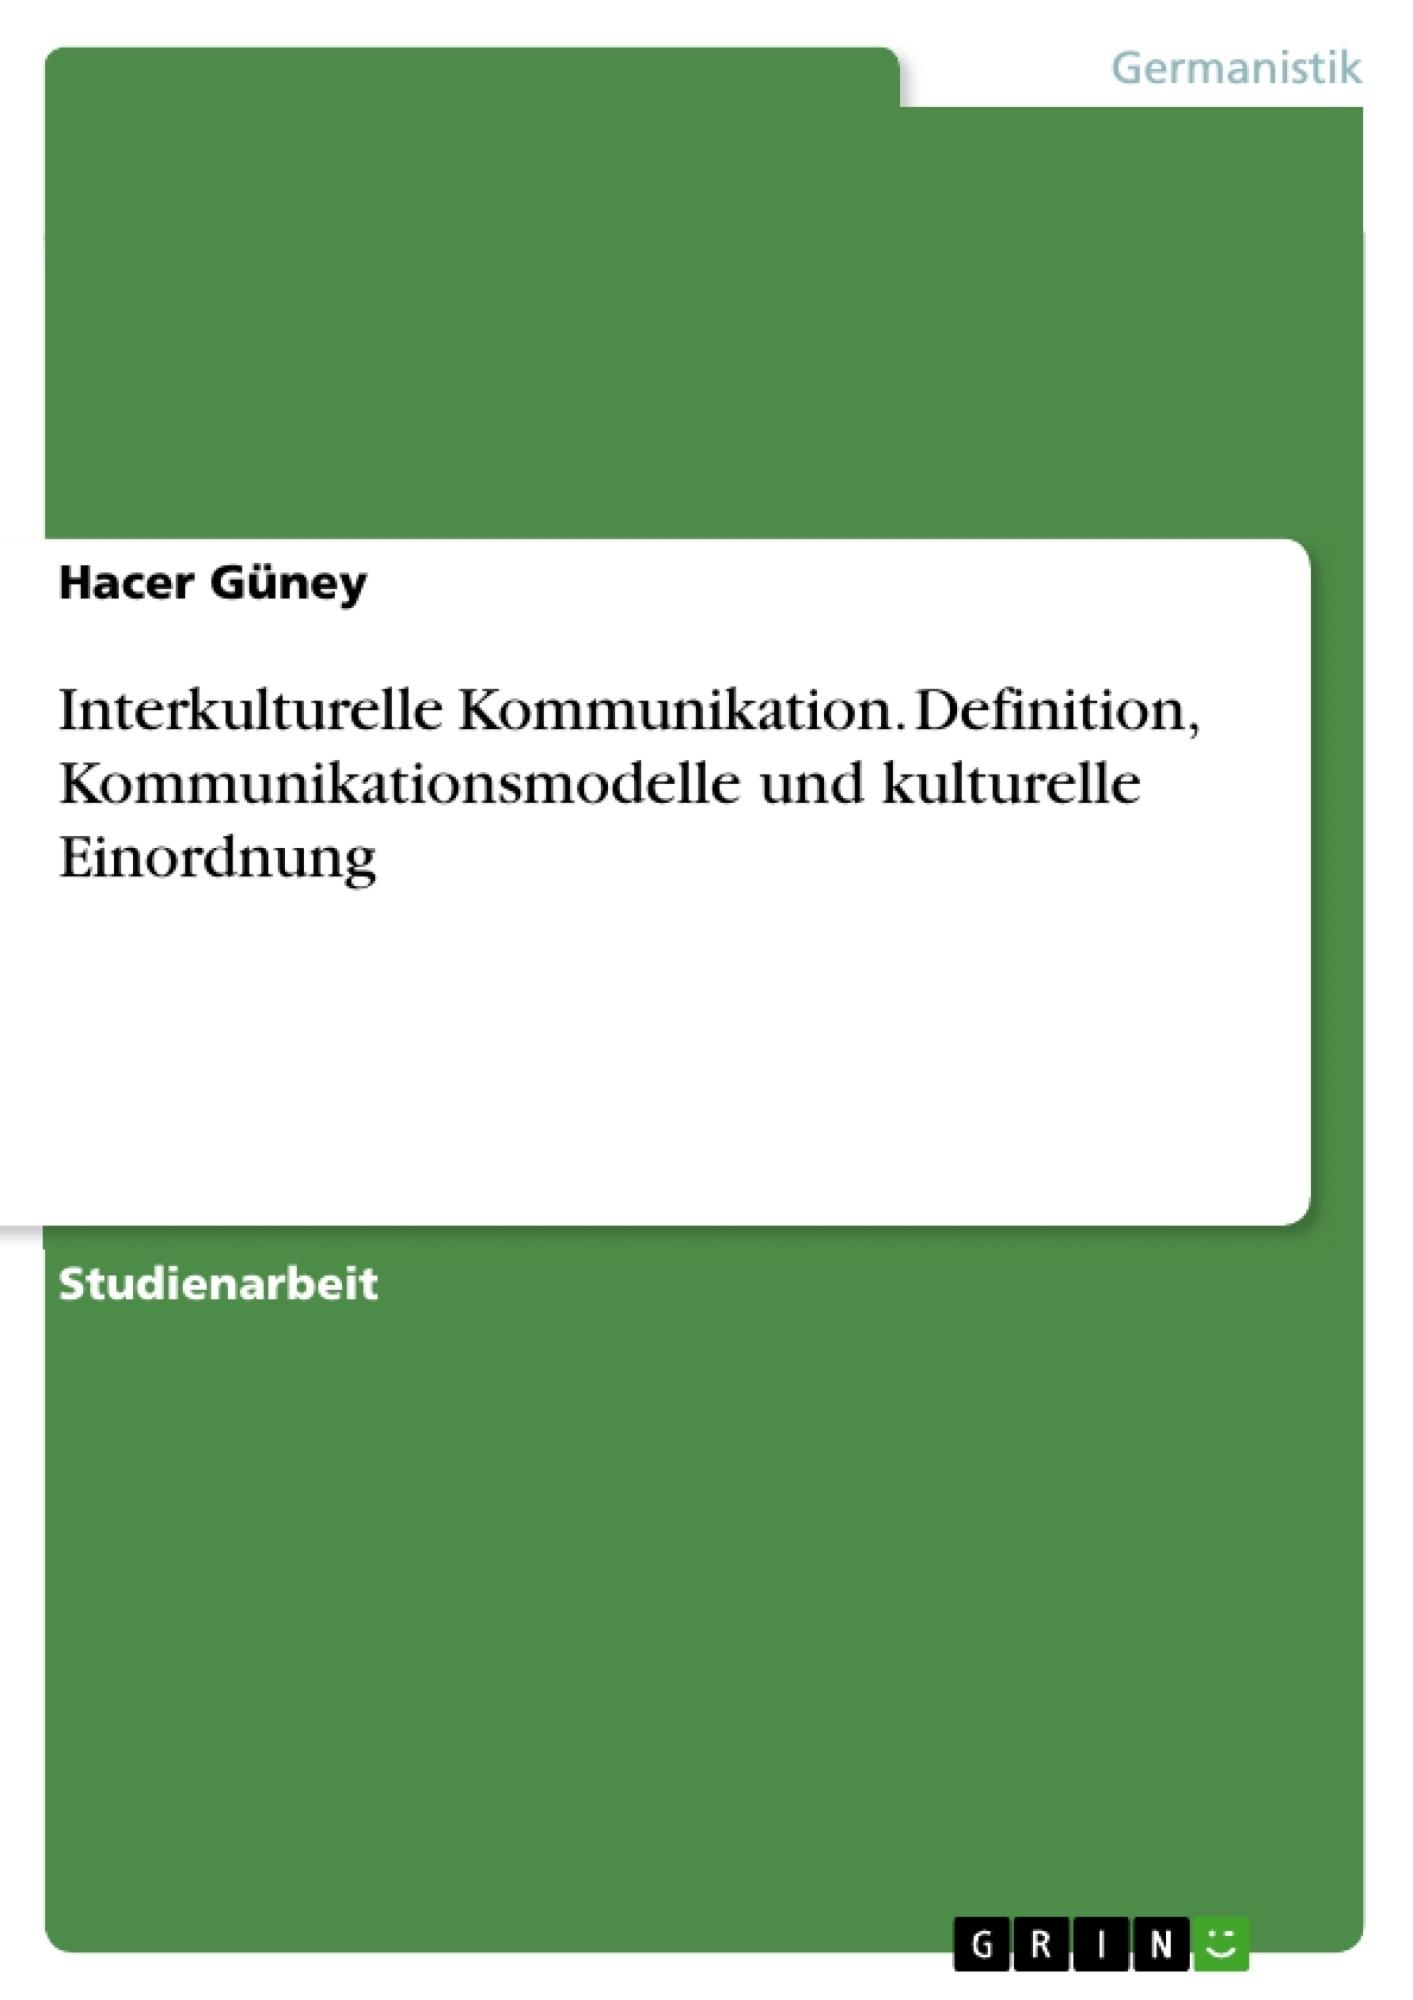 Titel: Interkulturelle Kommunikation. Definition, Kommunikationsmodelle und kulturelle Einordnung